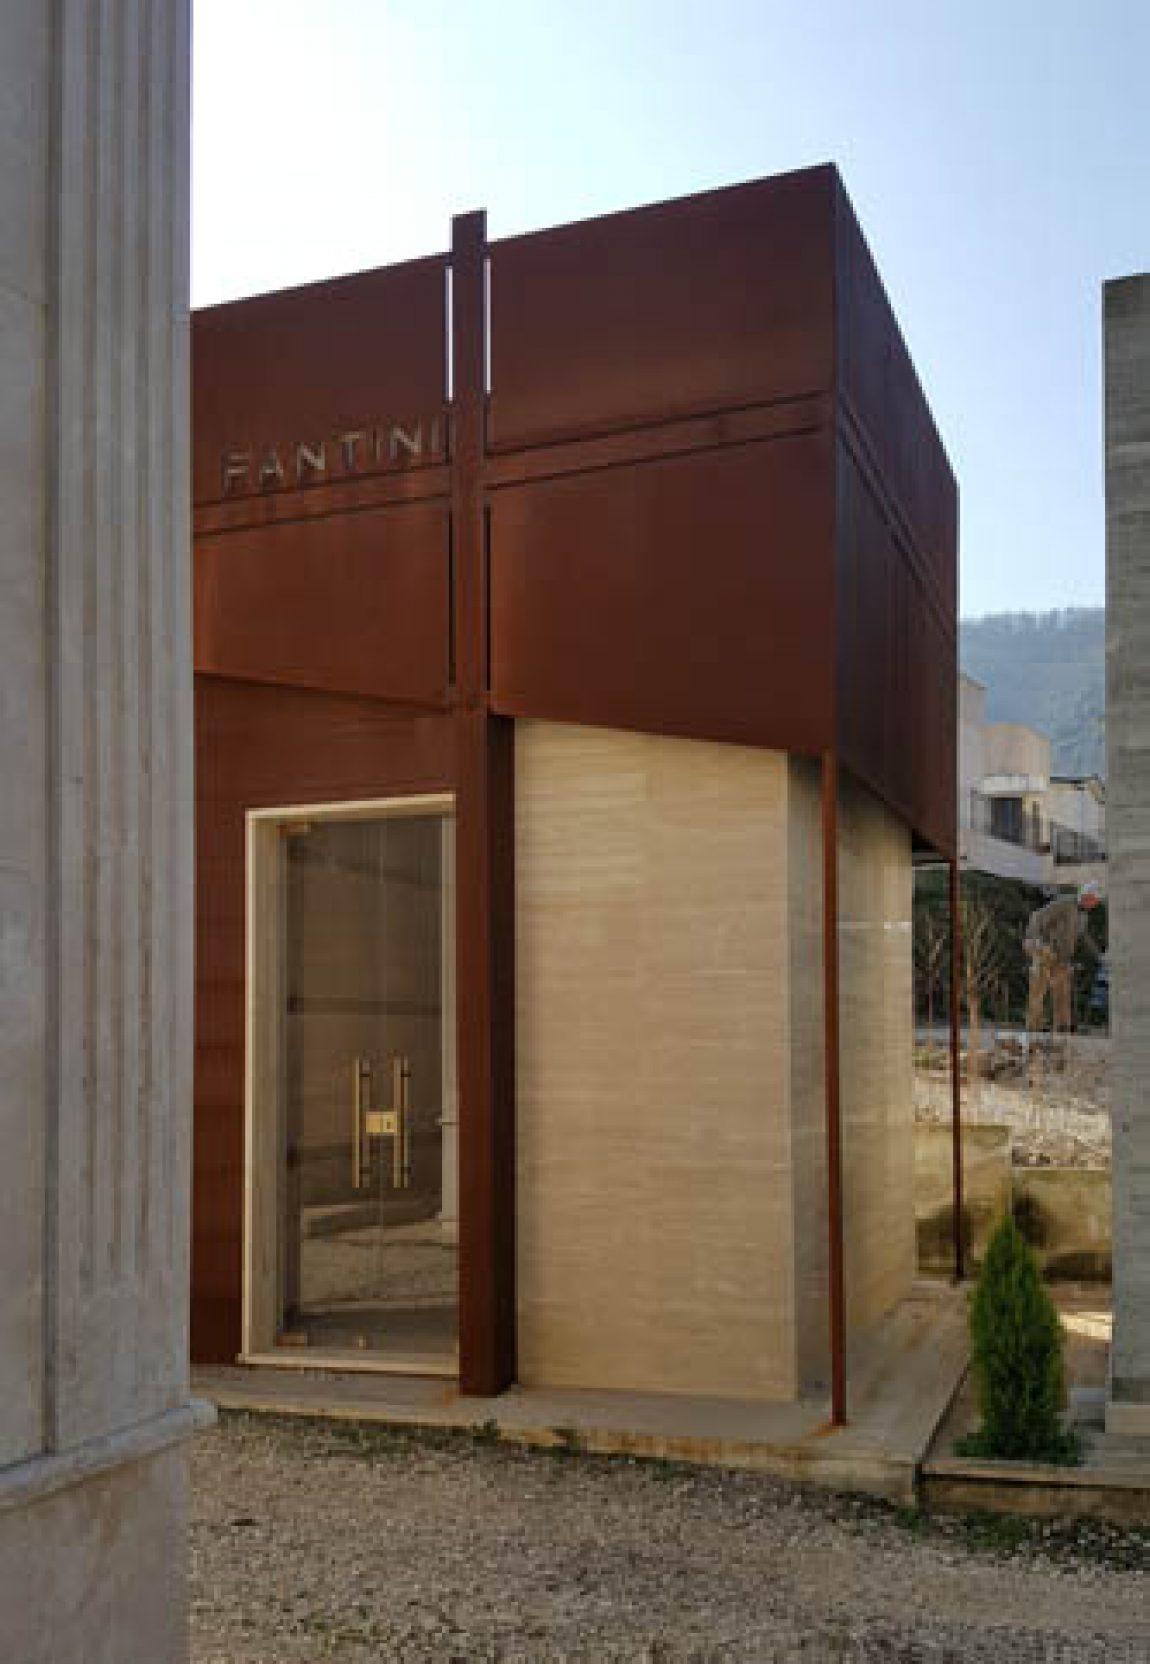 Cappella Funeraria Fantini Tivoli 03-4